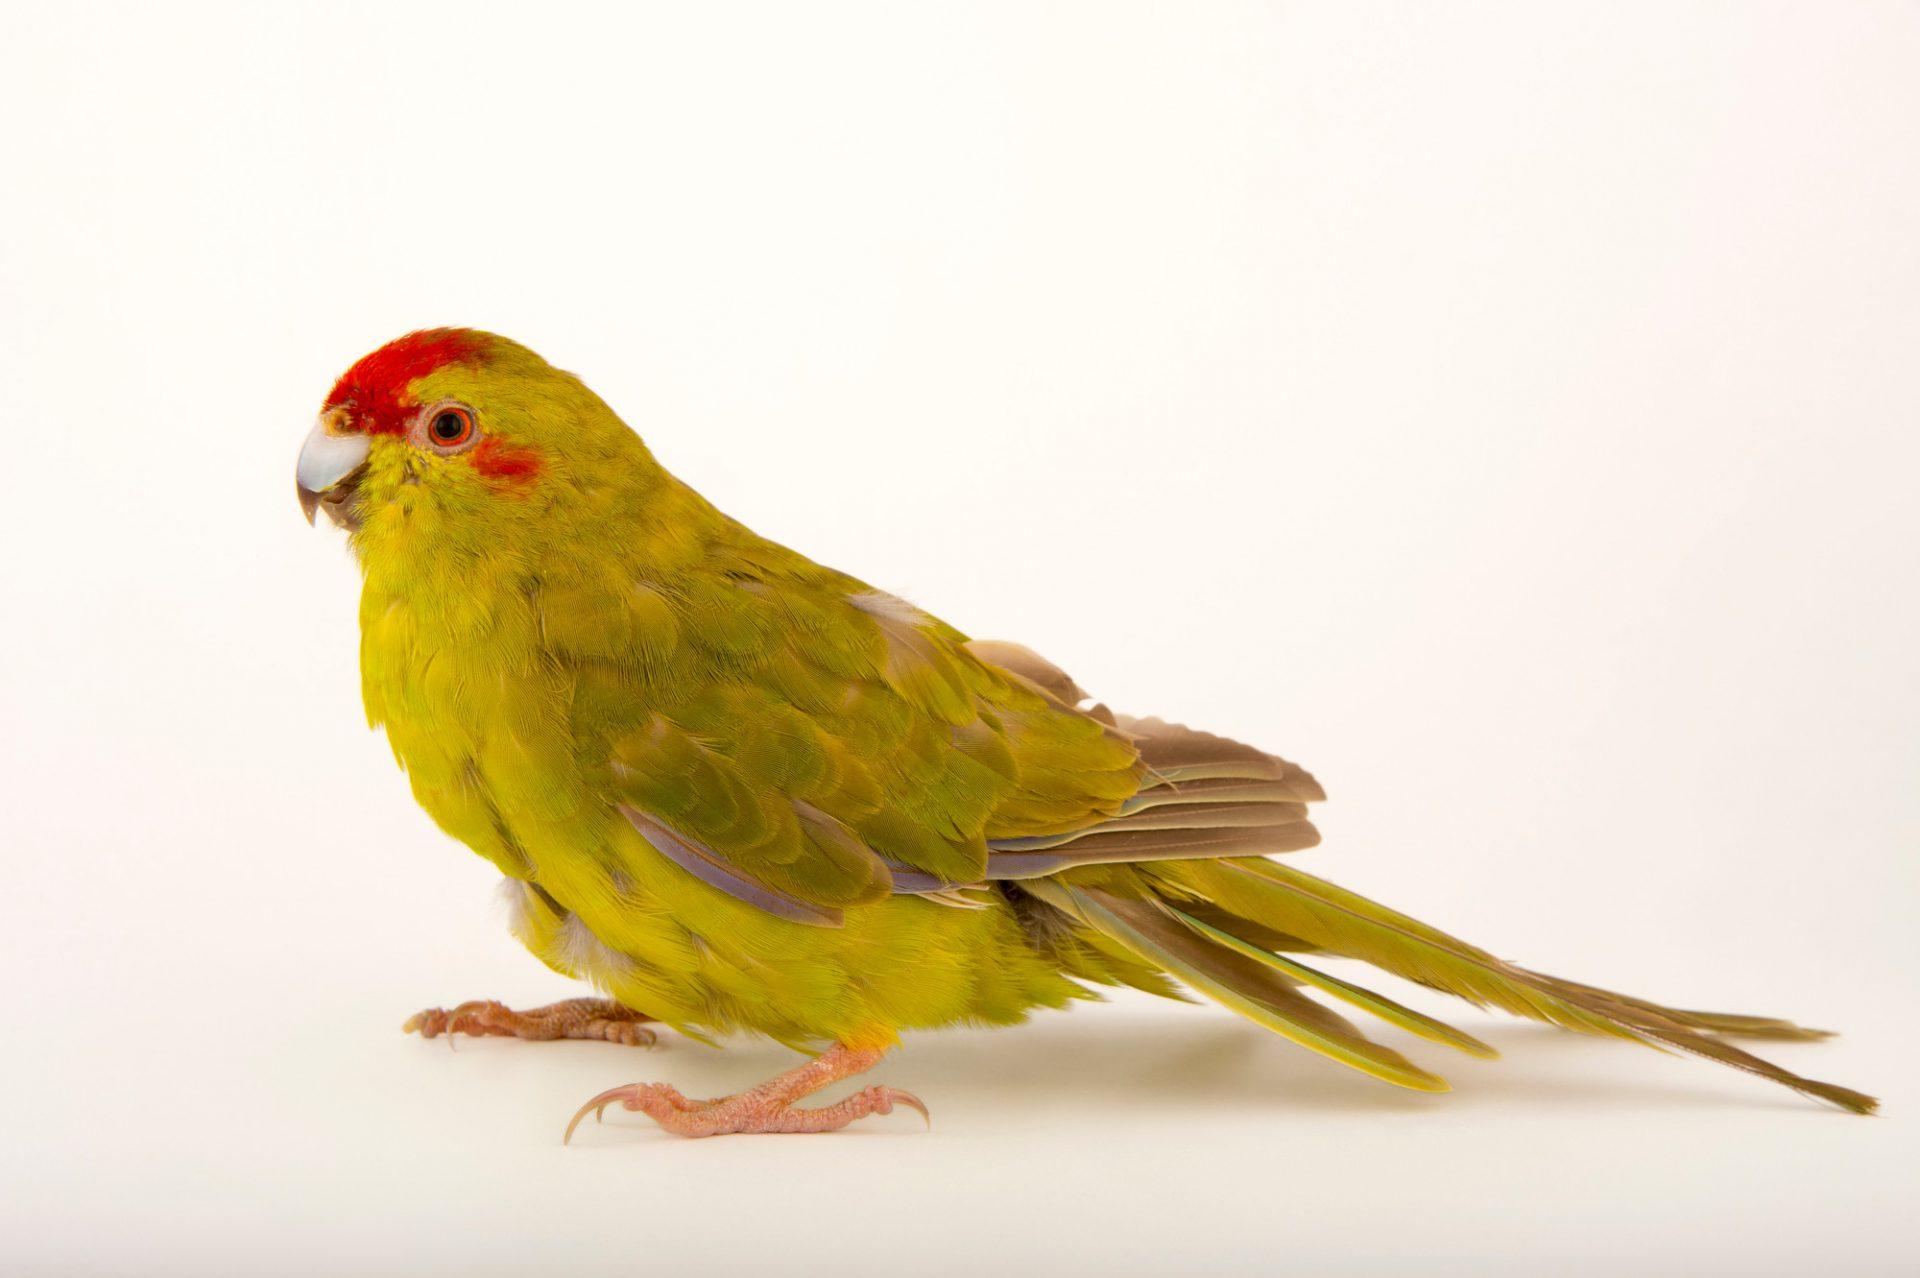 Photo: A female, vulnerable red-crowned parakeet (Cyanoramphus novaezelandiae) named 'Gidget'.